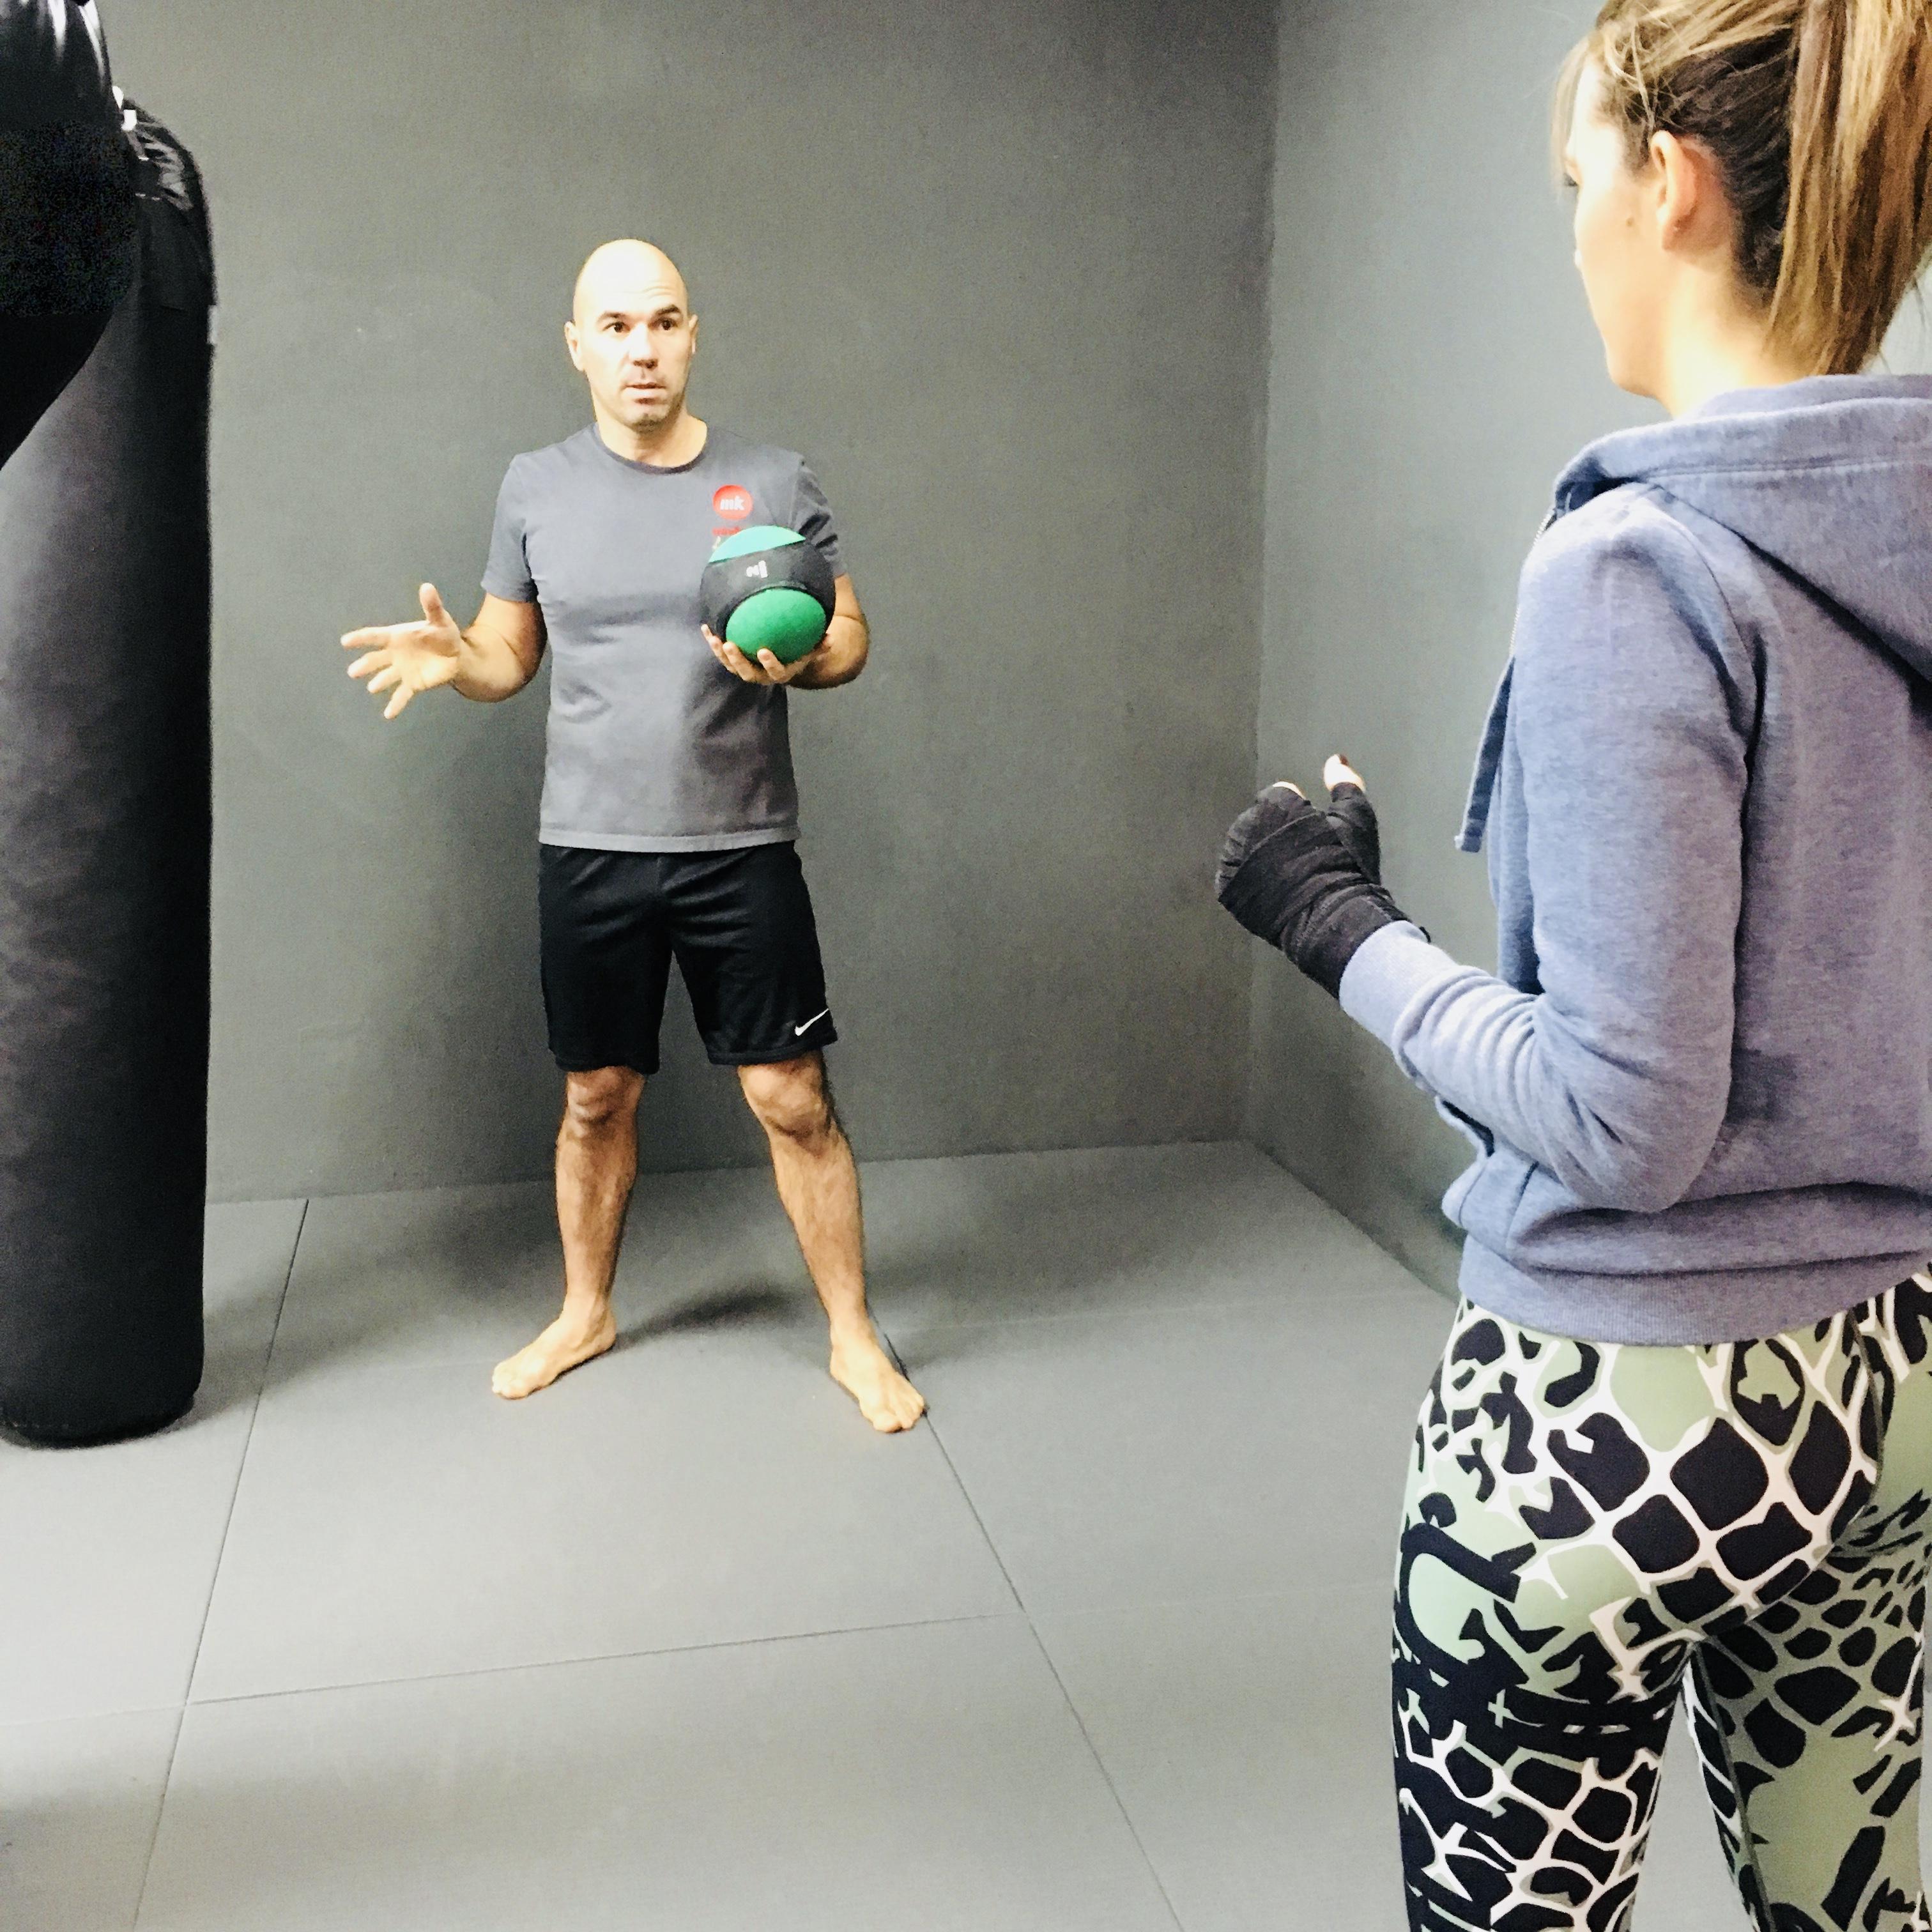 Sportpsychologie - Fitness Health